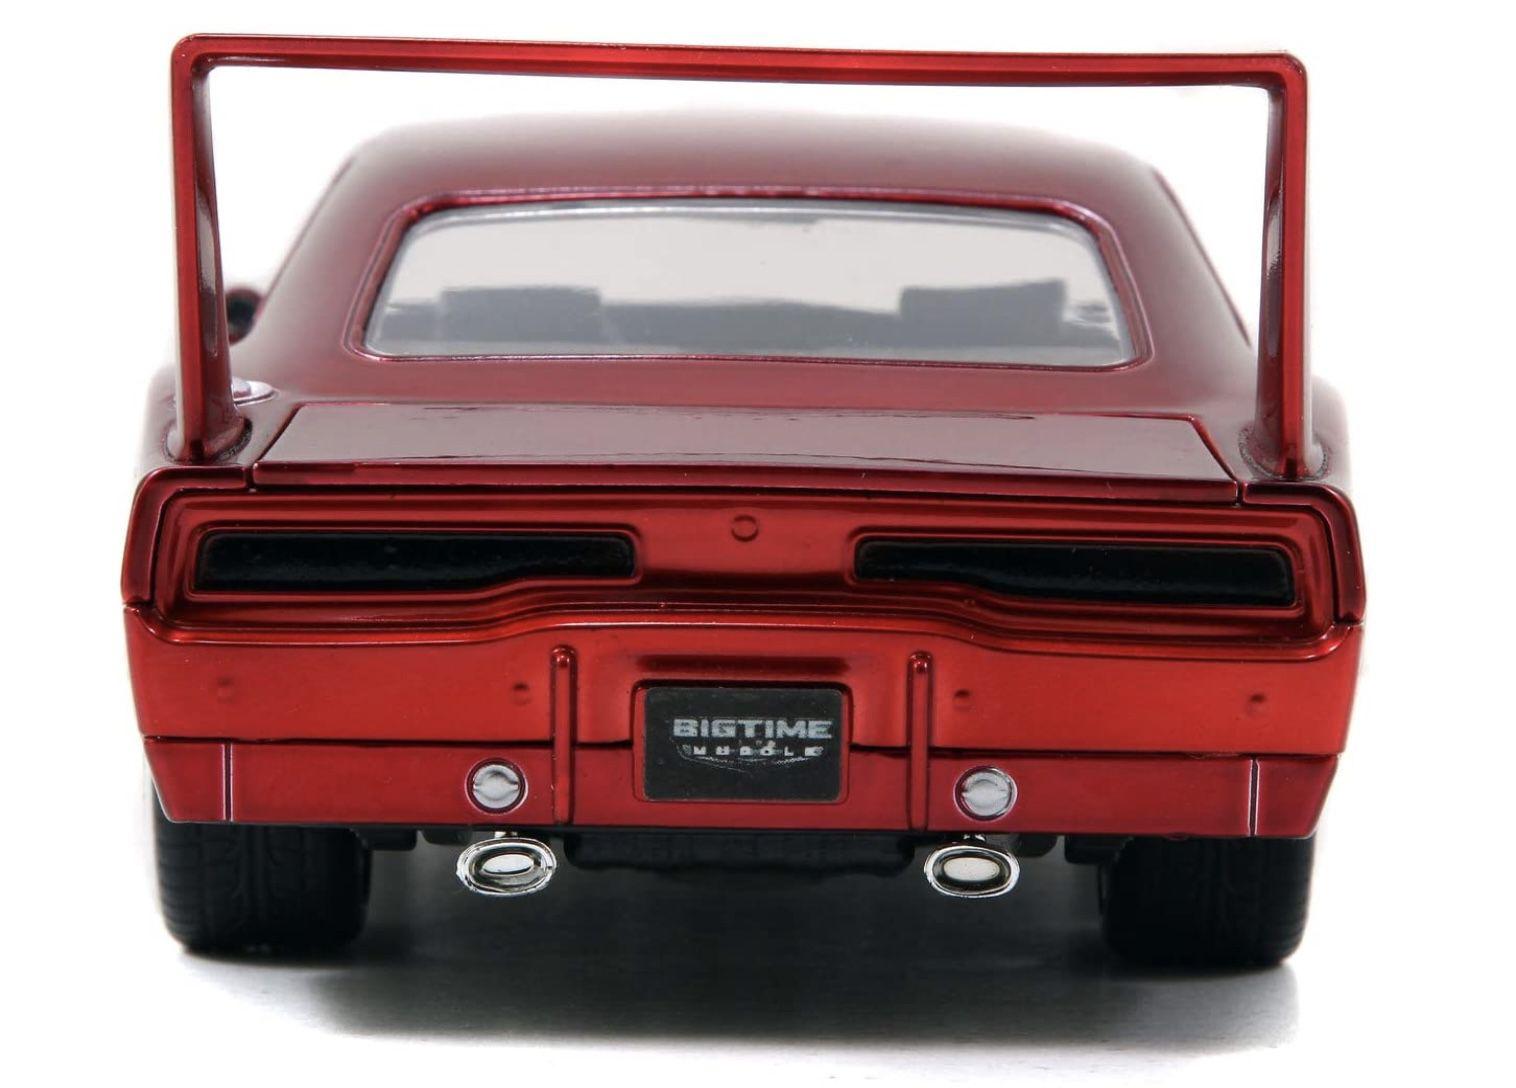 Jada Toys Fast & Furious Doms 1969 Dodge Charger Daytona im Maßstab 1:24 für 21,06€ (statt 30€)   Prime